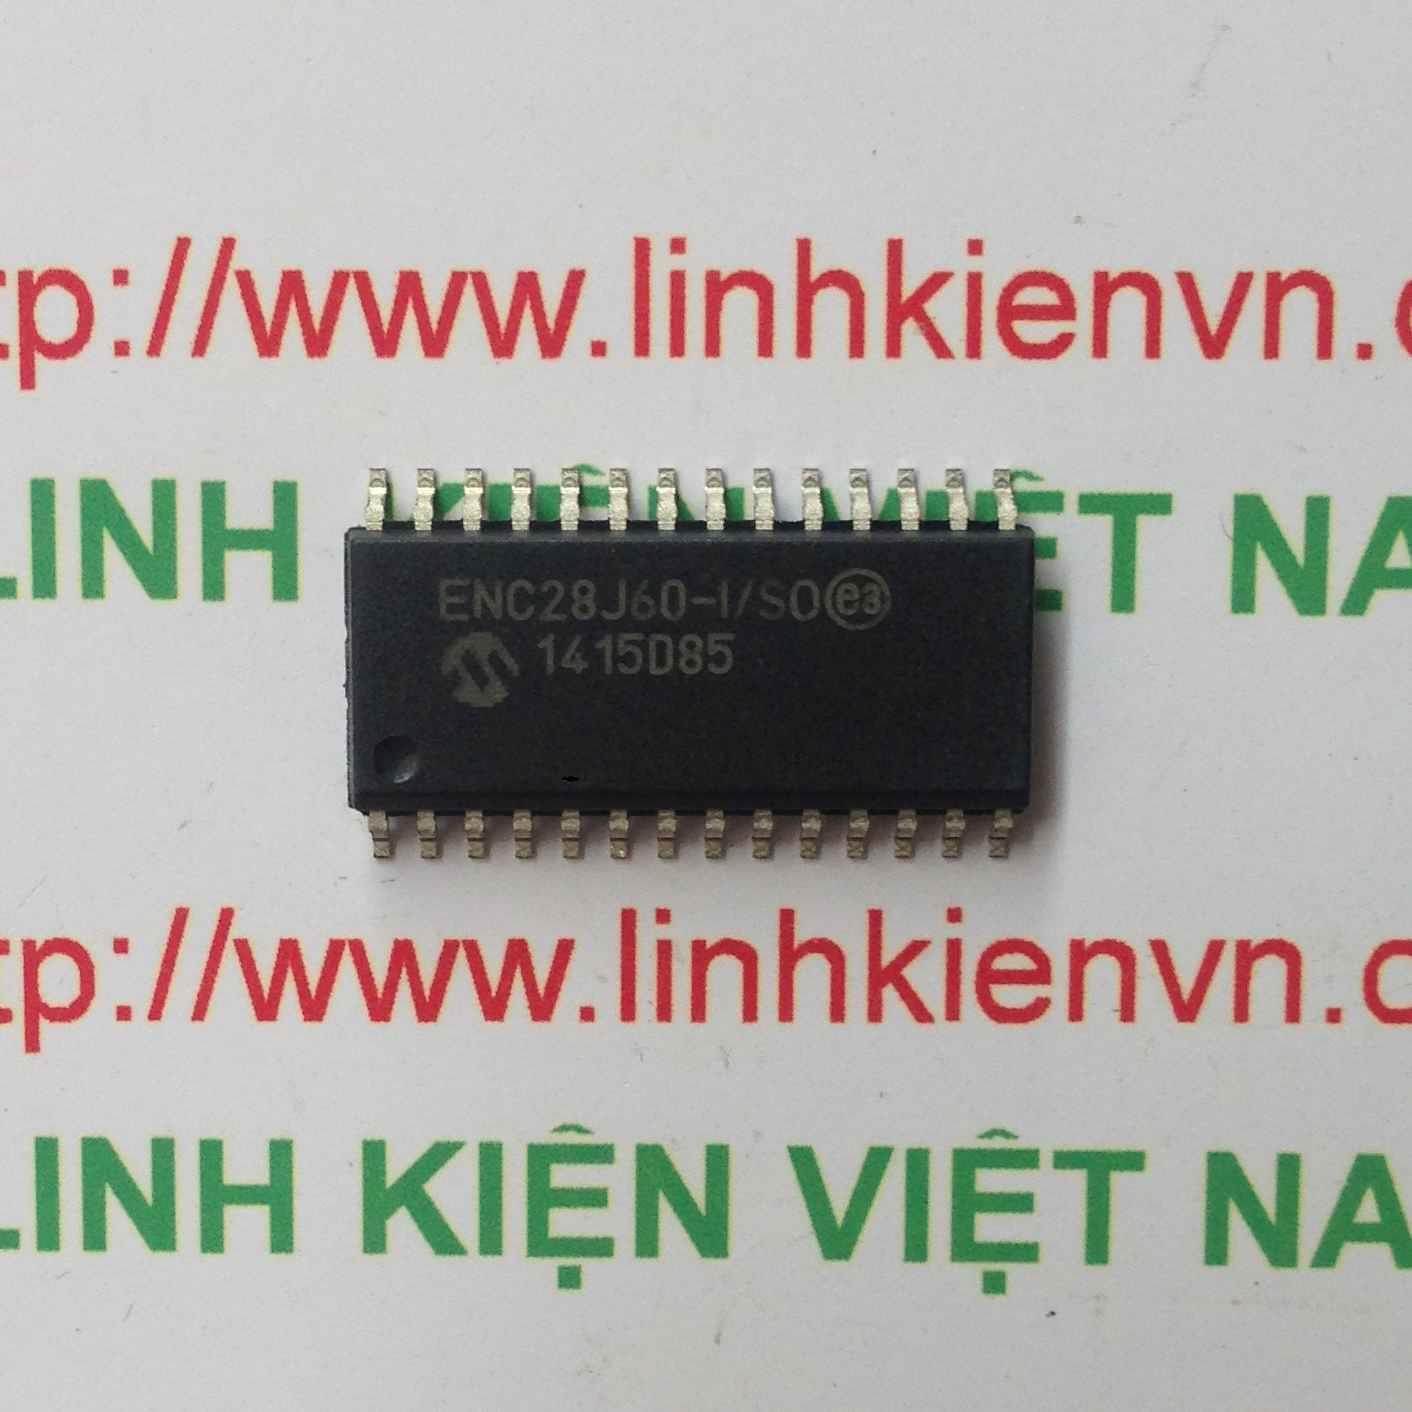 IC ETHERNET ENC28J60 I/SO - F9H7